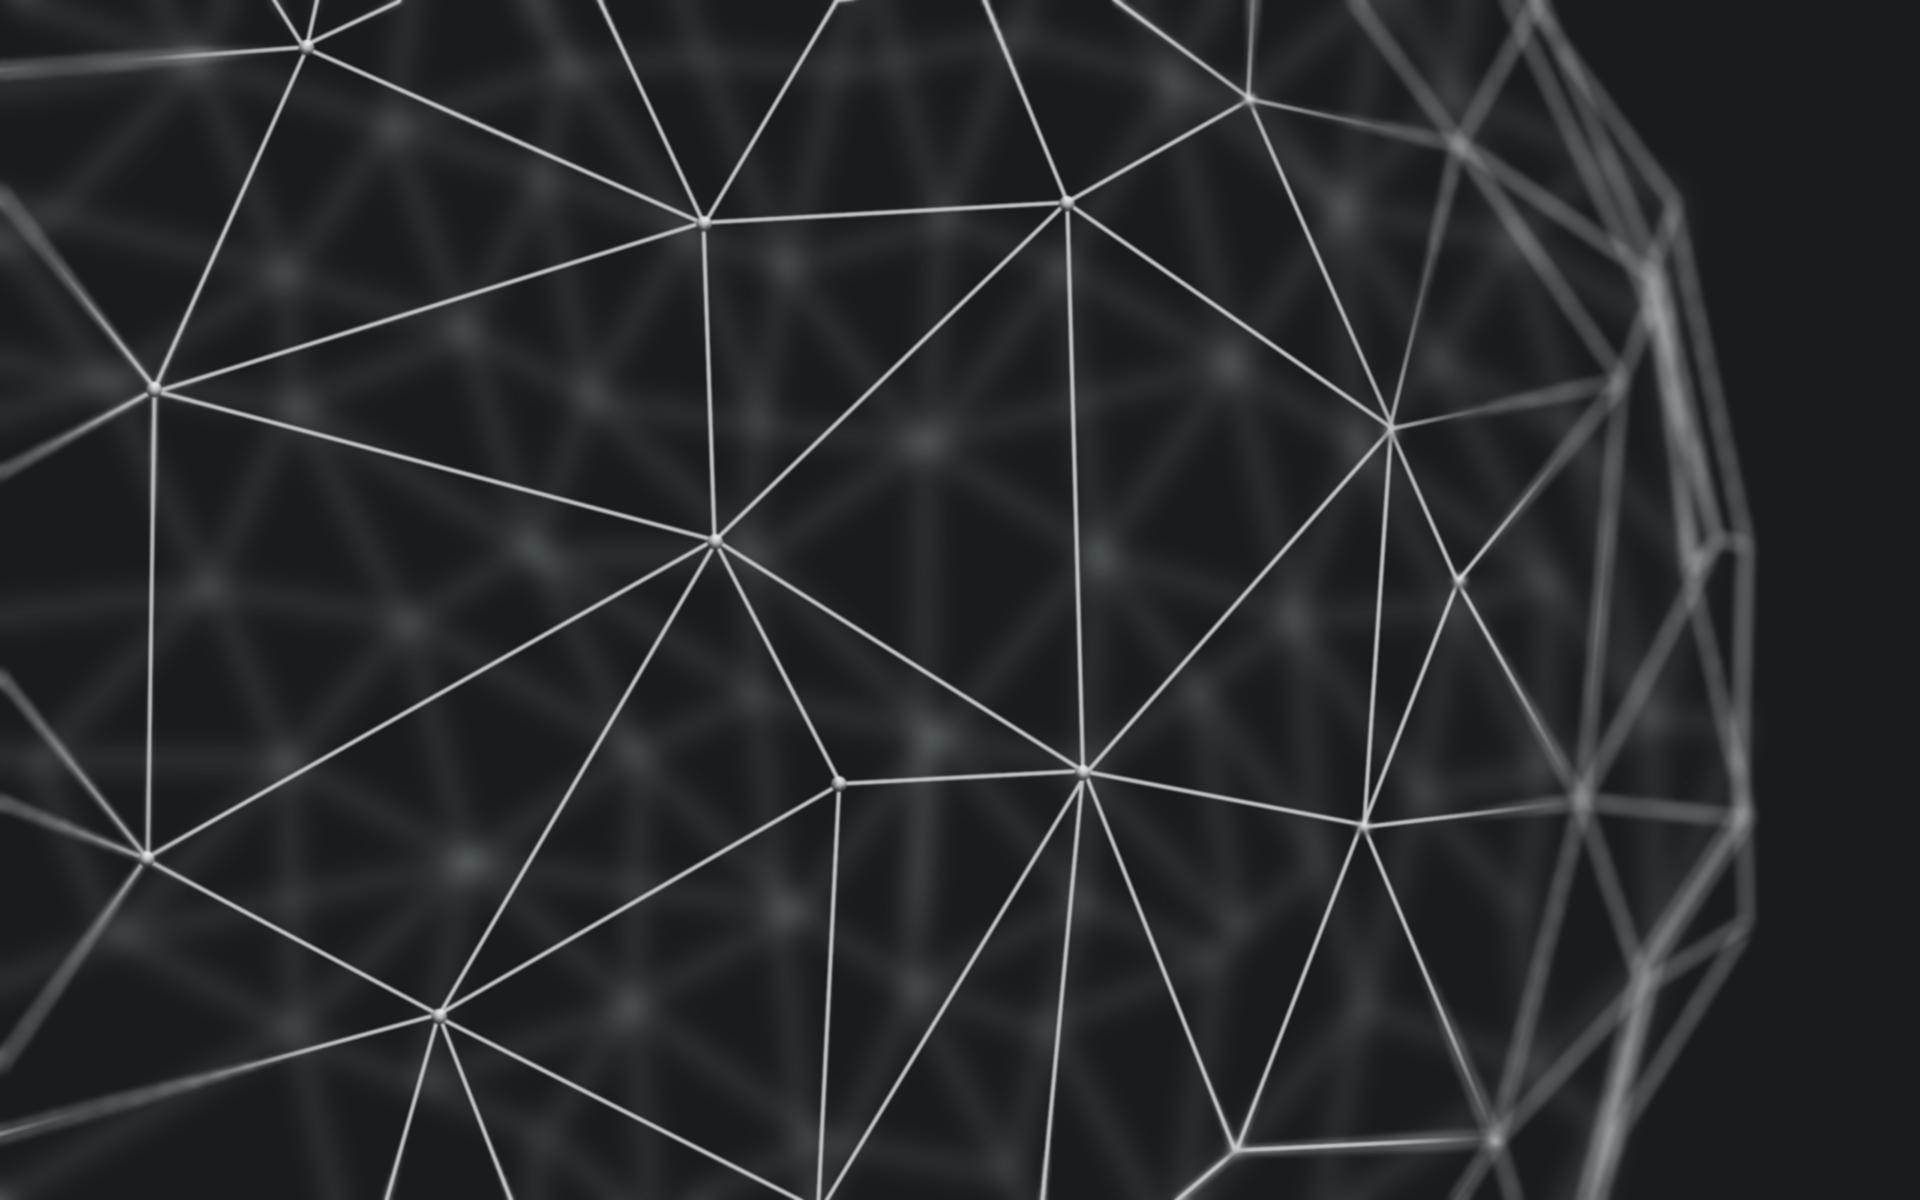 Geometric Animal Wallpaper 74 Images: Levent-aridag